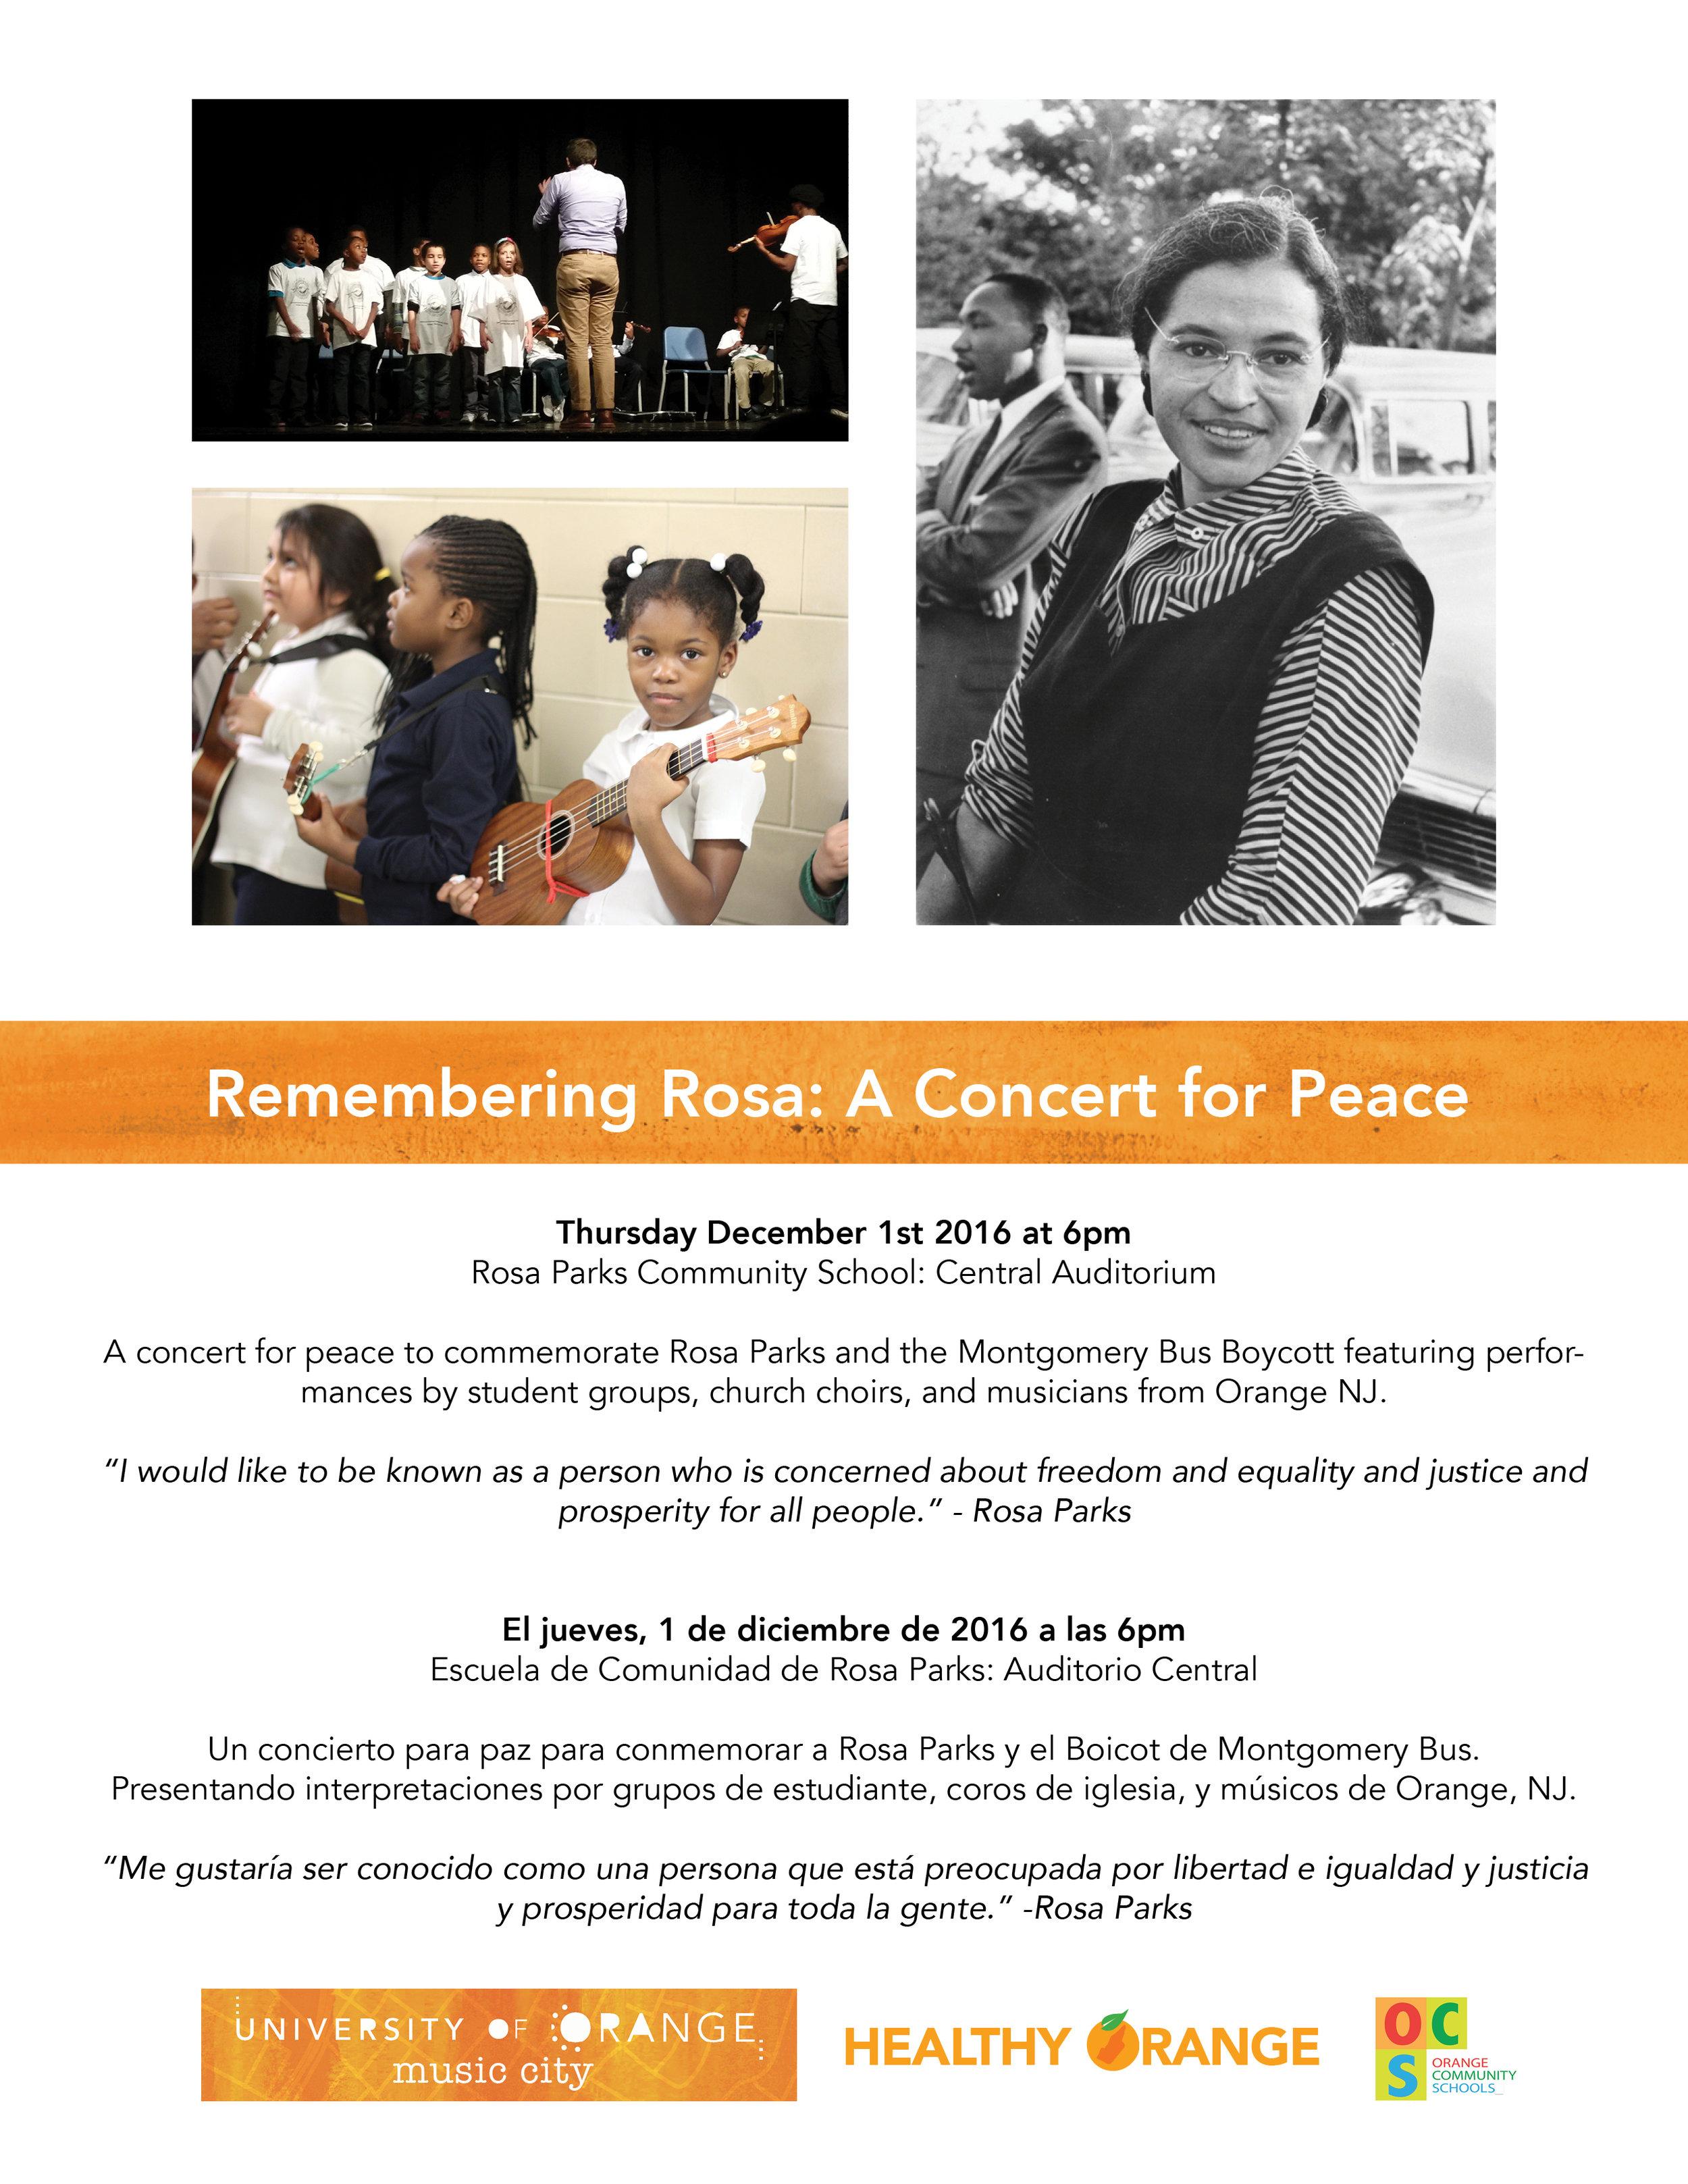 Remembering Rosa flyer